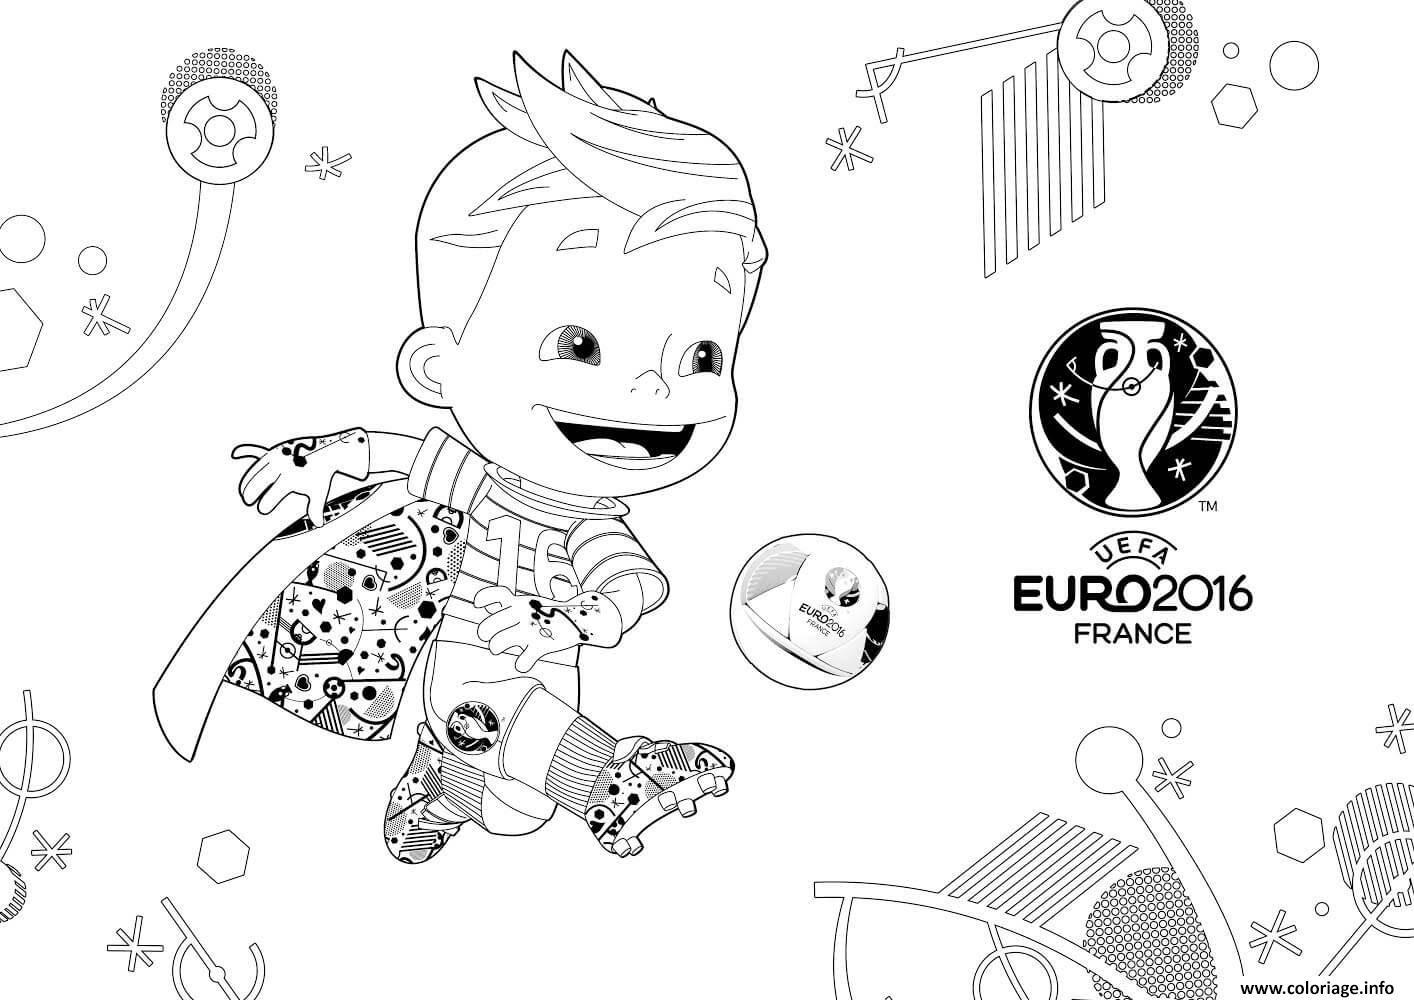 Coloriage Mascotte Euro 2016 France Uefa Jecoloriecom